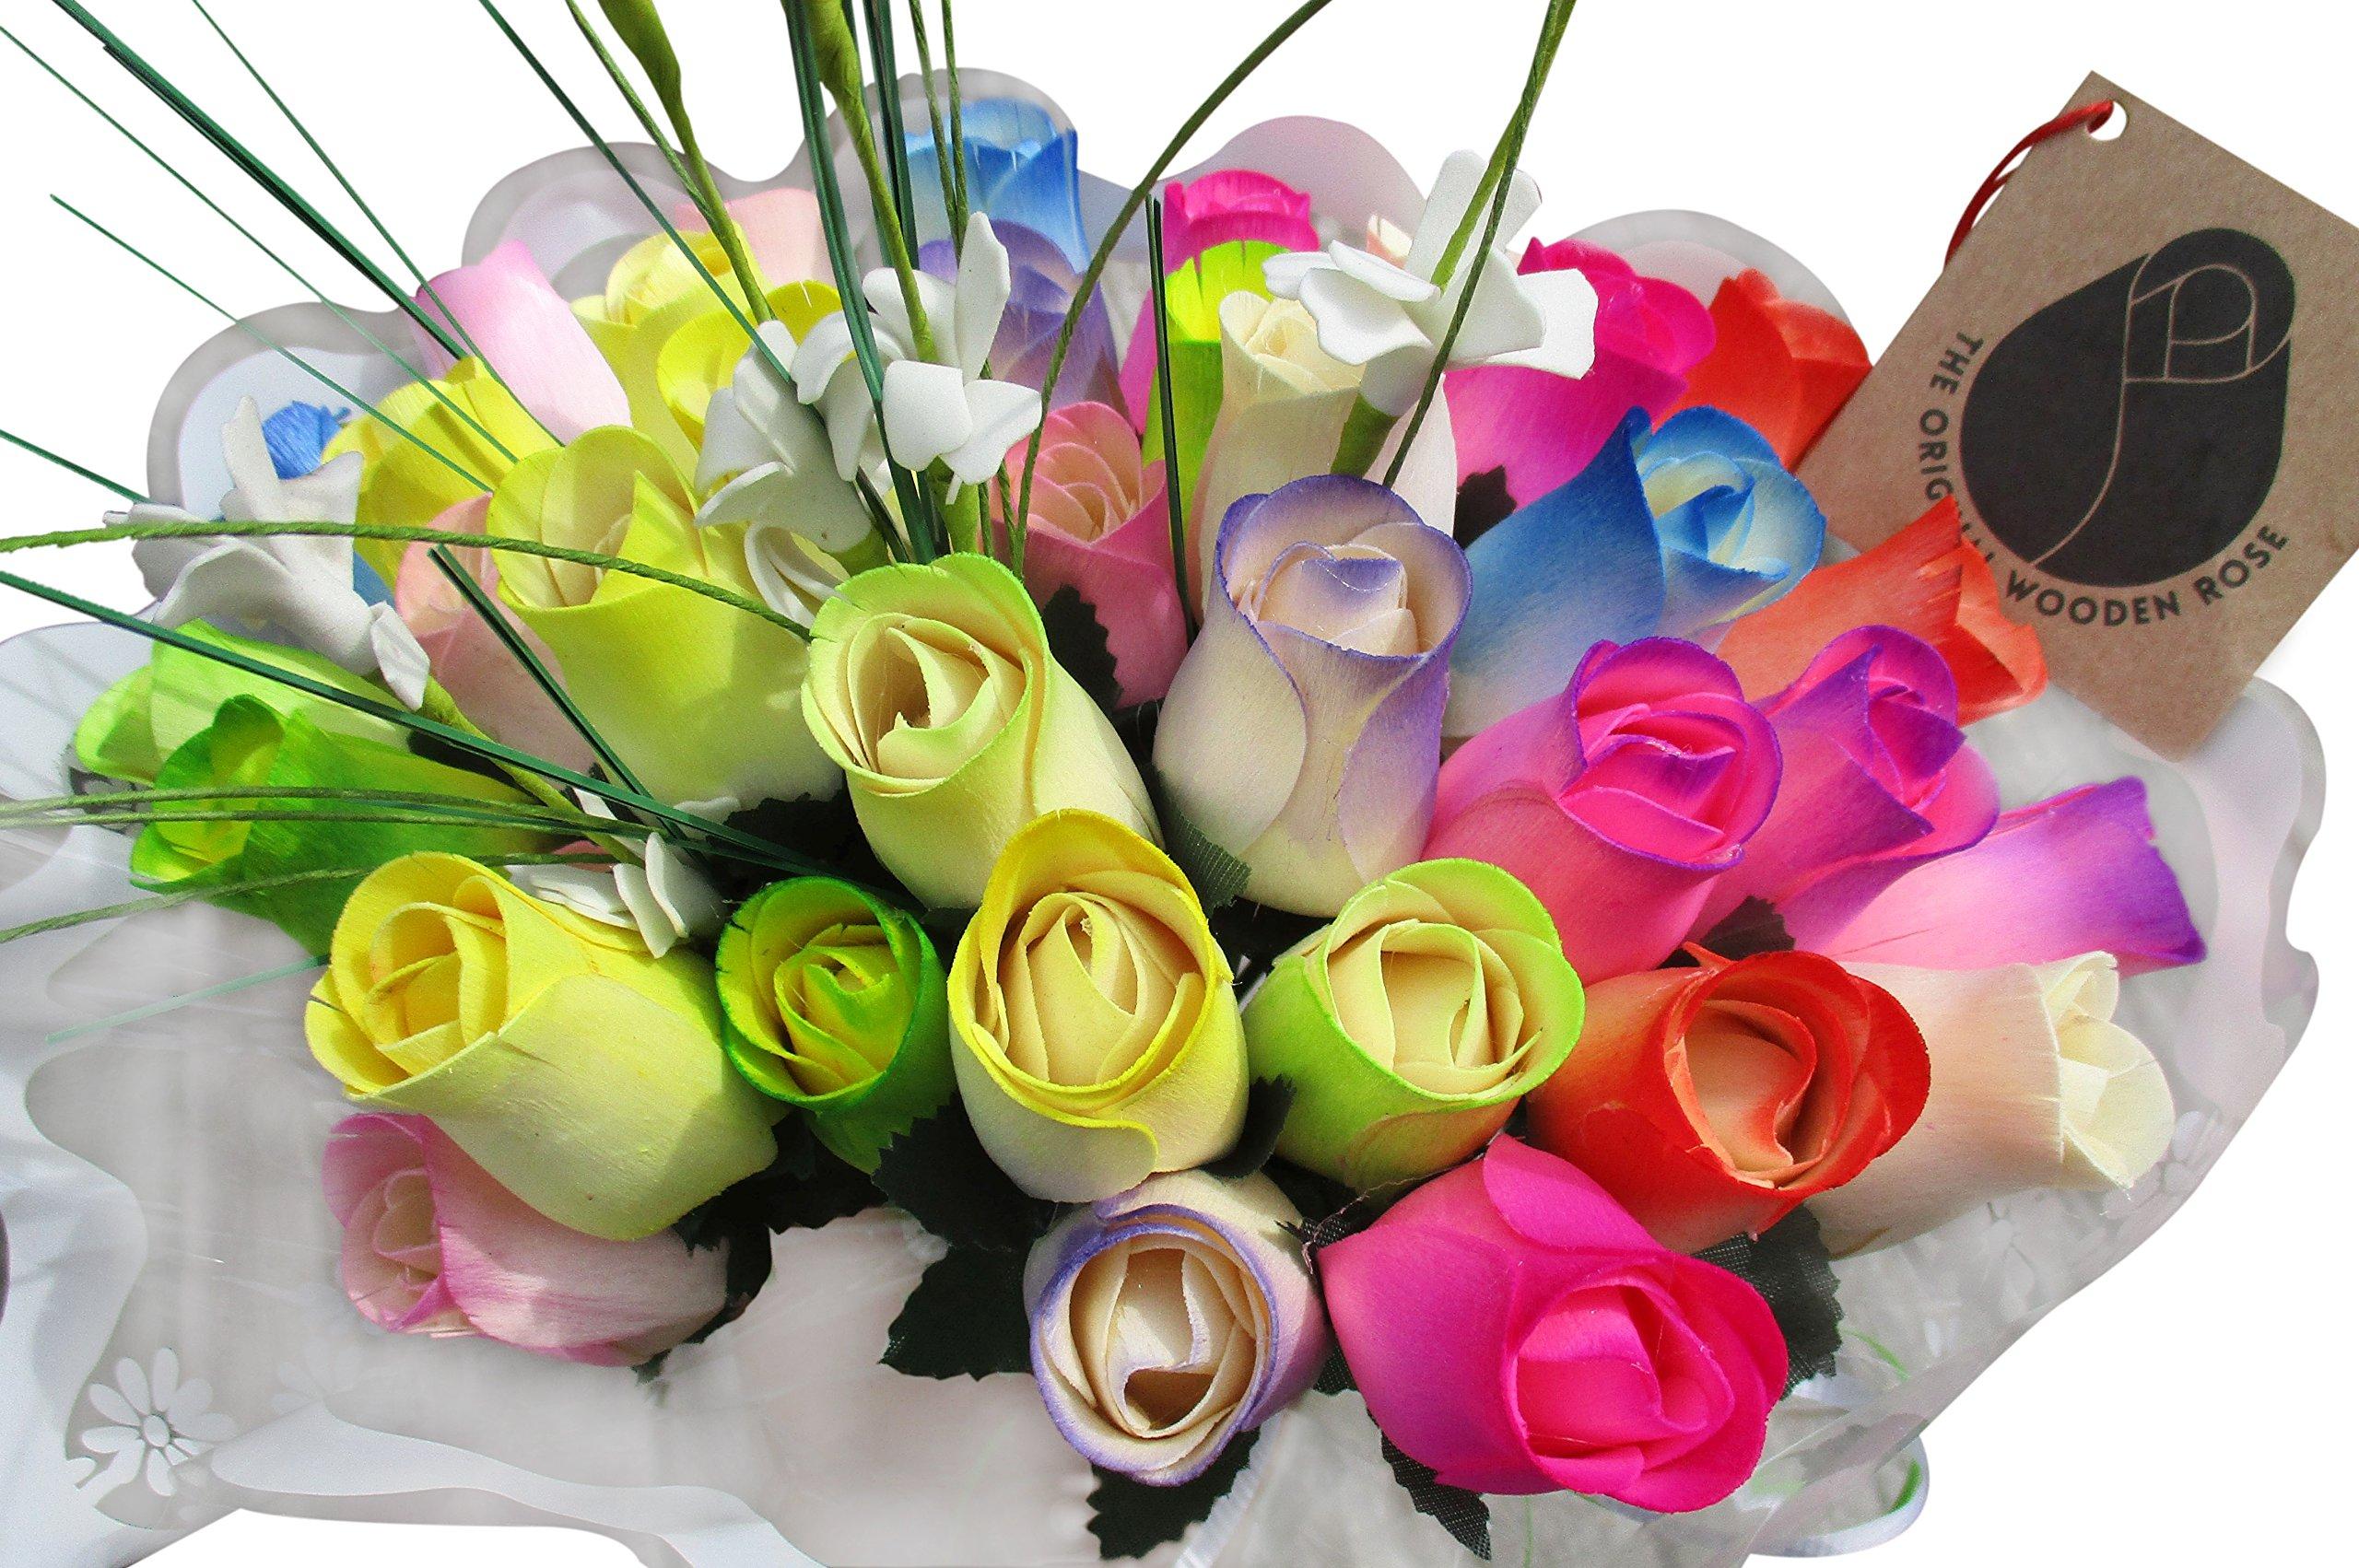 silk flower arrangements the original wooden rose spring easter flower bouquet closed bud (3 dozen)